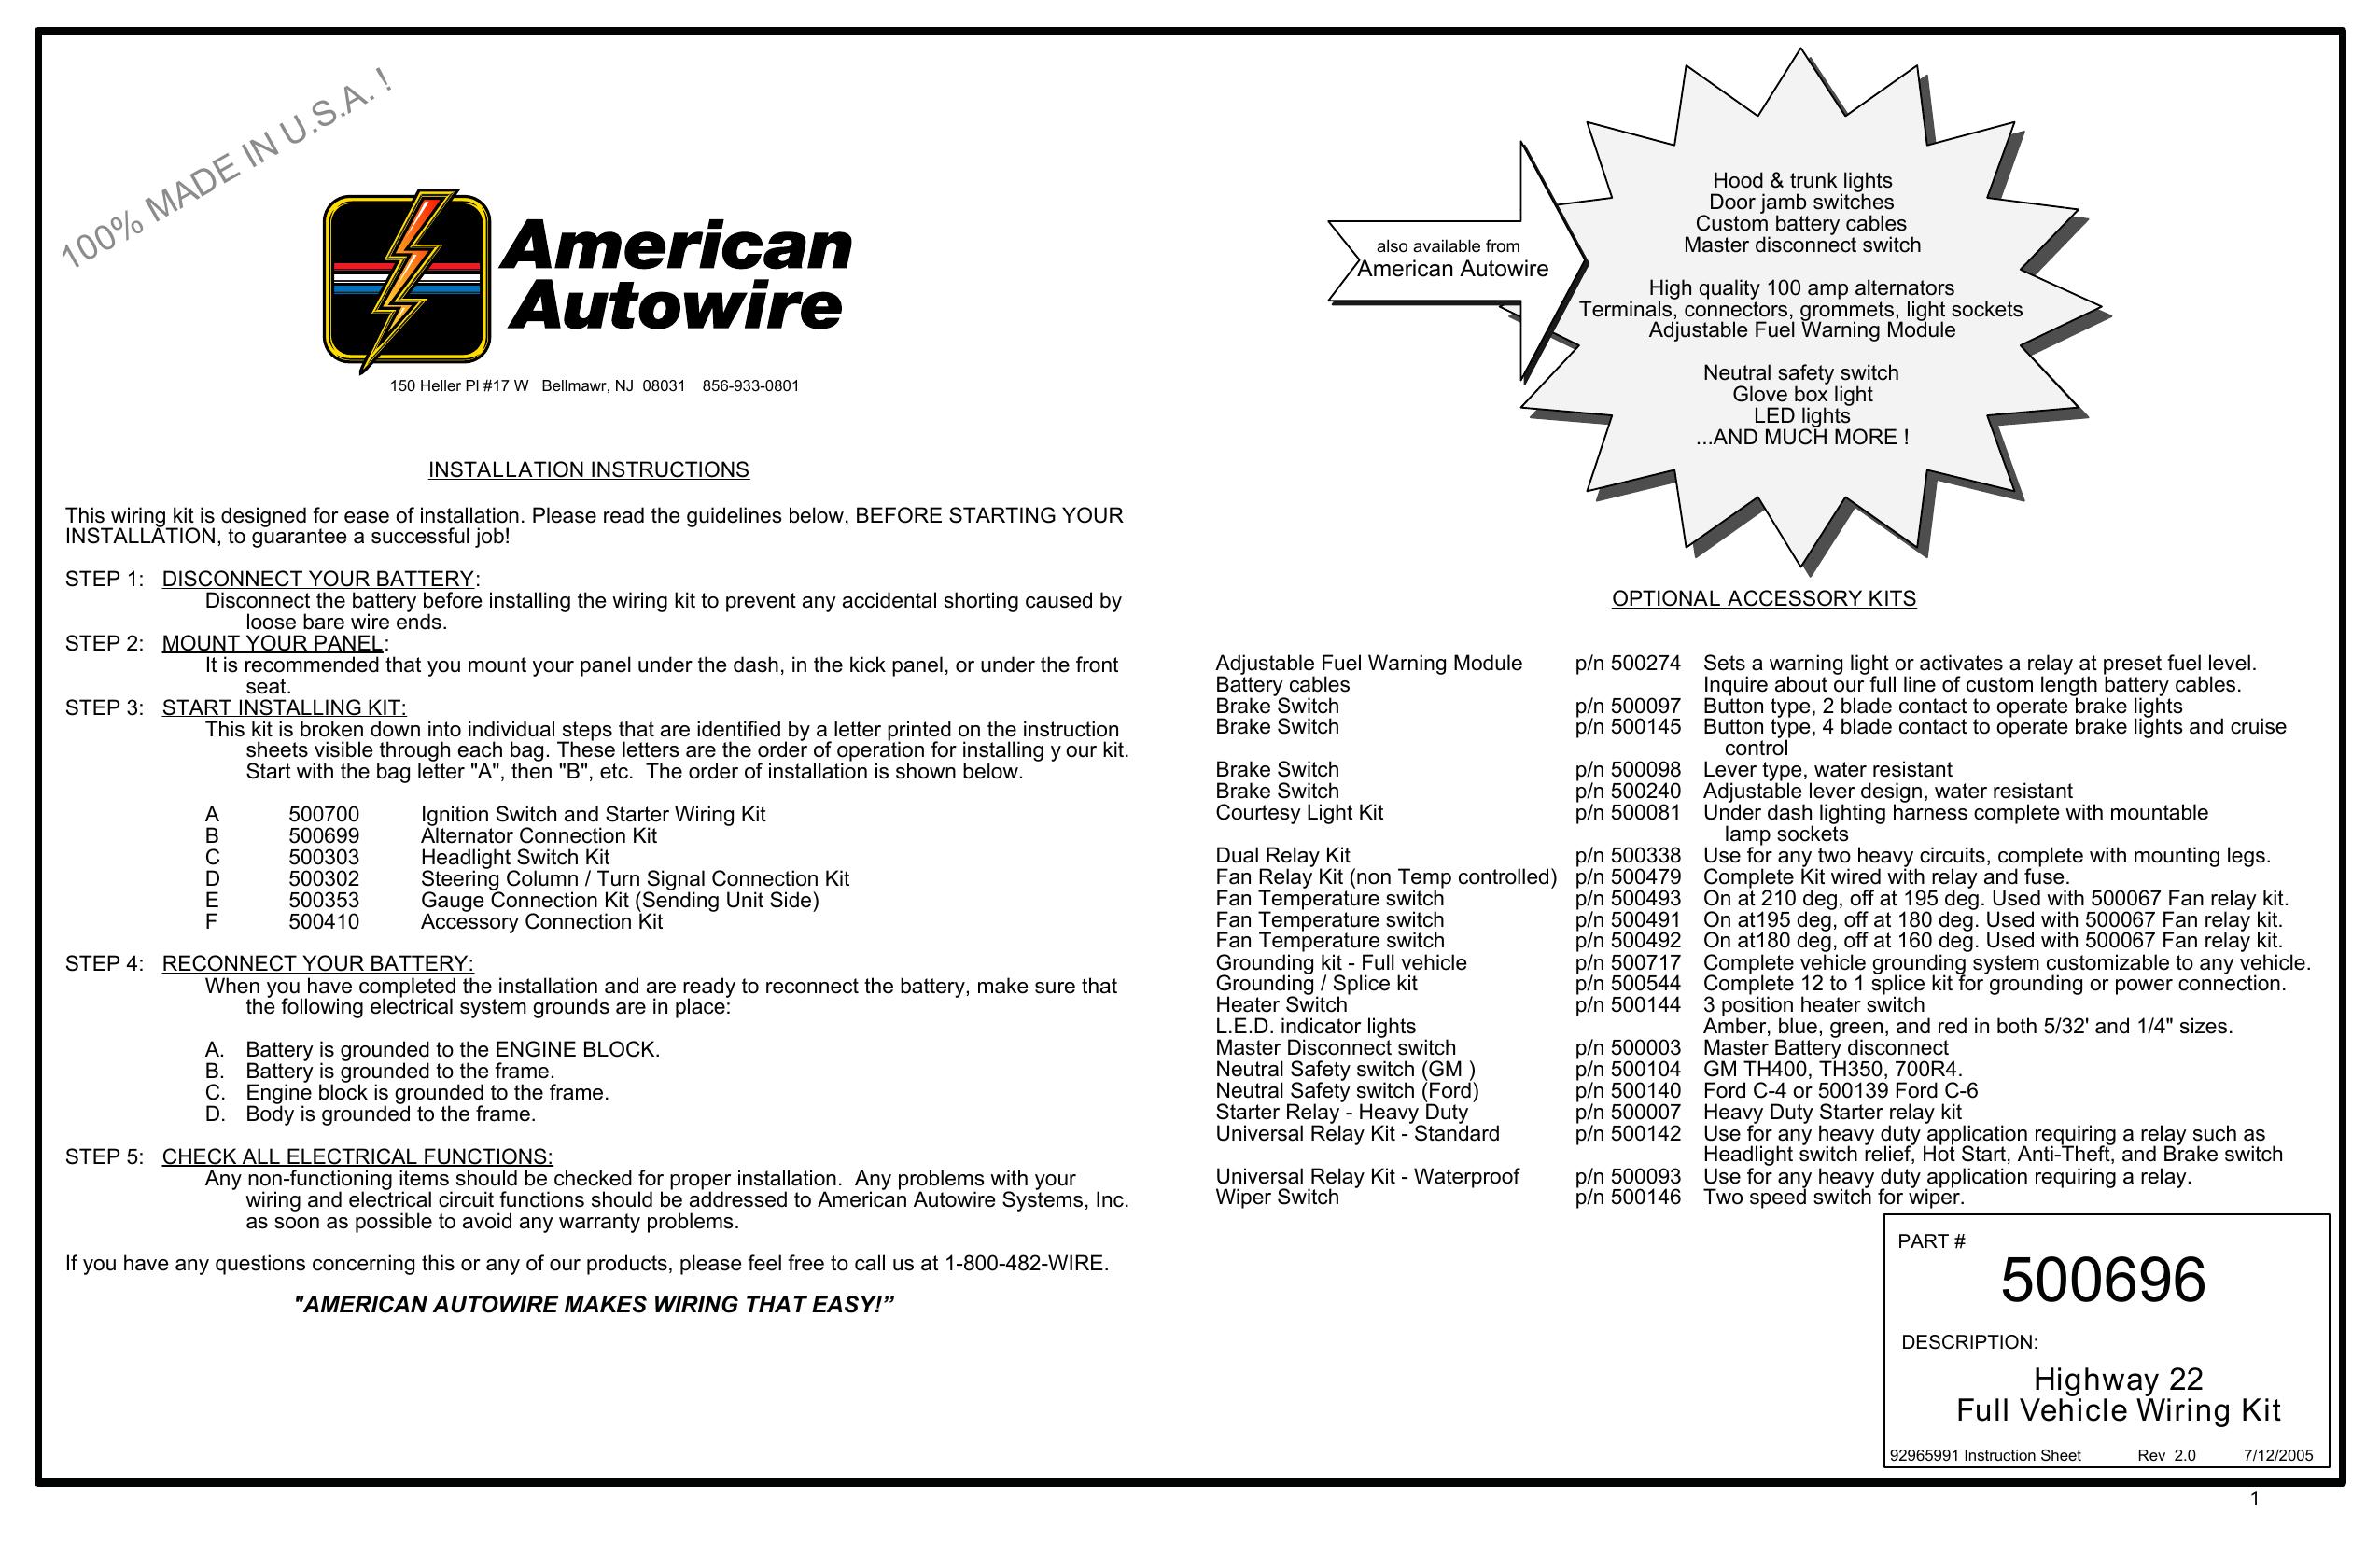 33 American Auto Wire Wiring Diagram